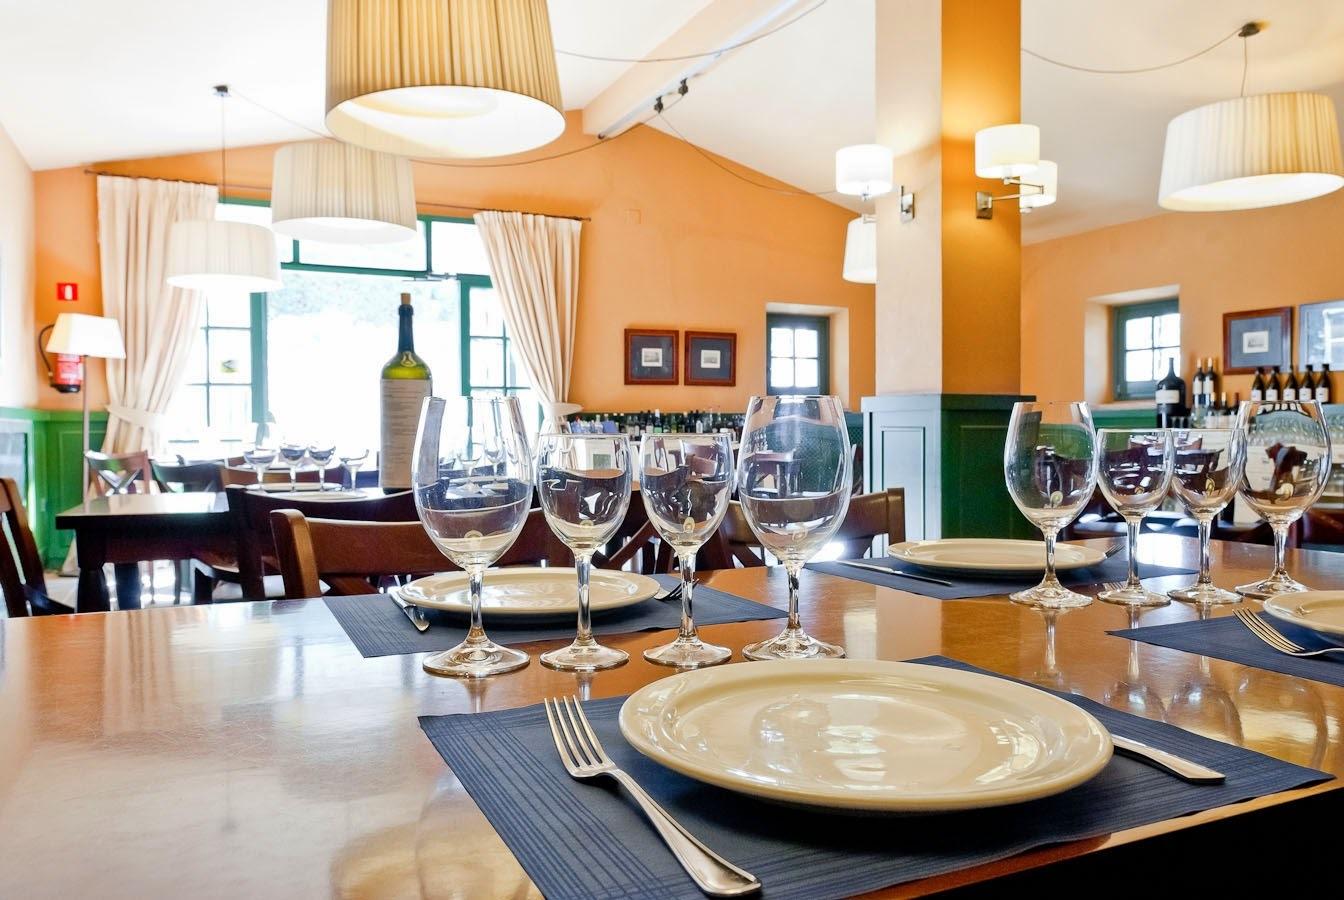 Bildergalerie Hapimag Resort MAS NOU © Hapimag Resort MAS NOU